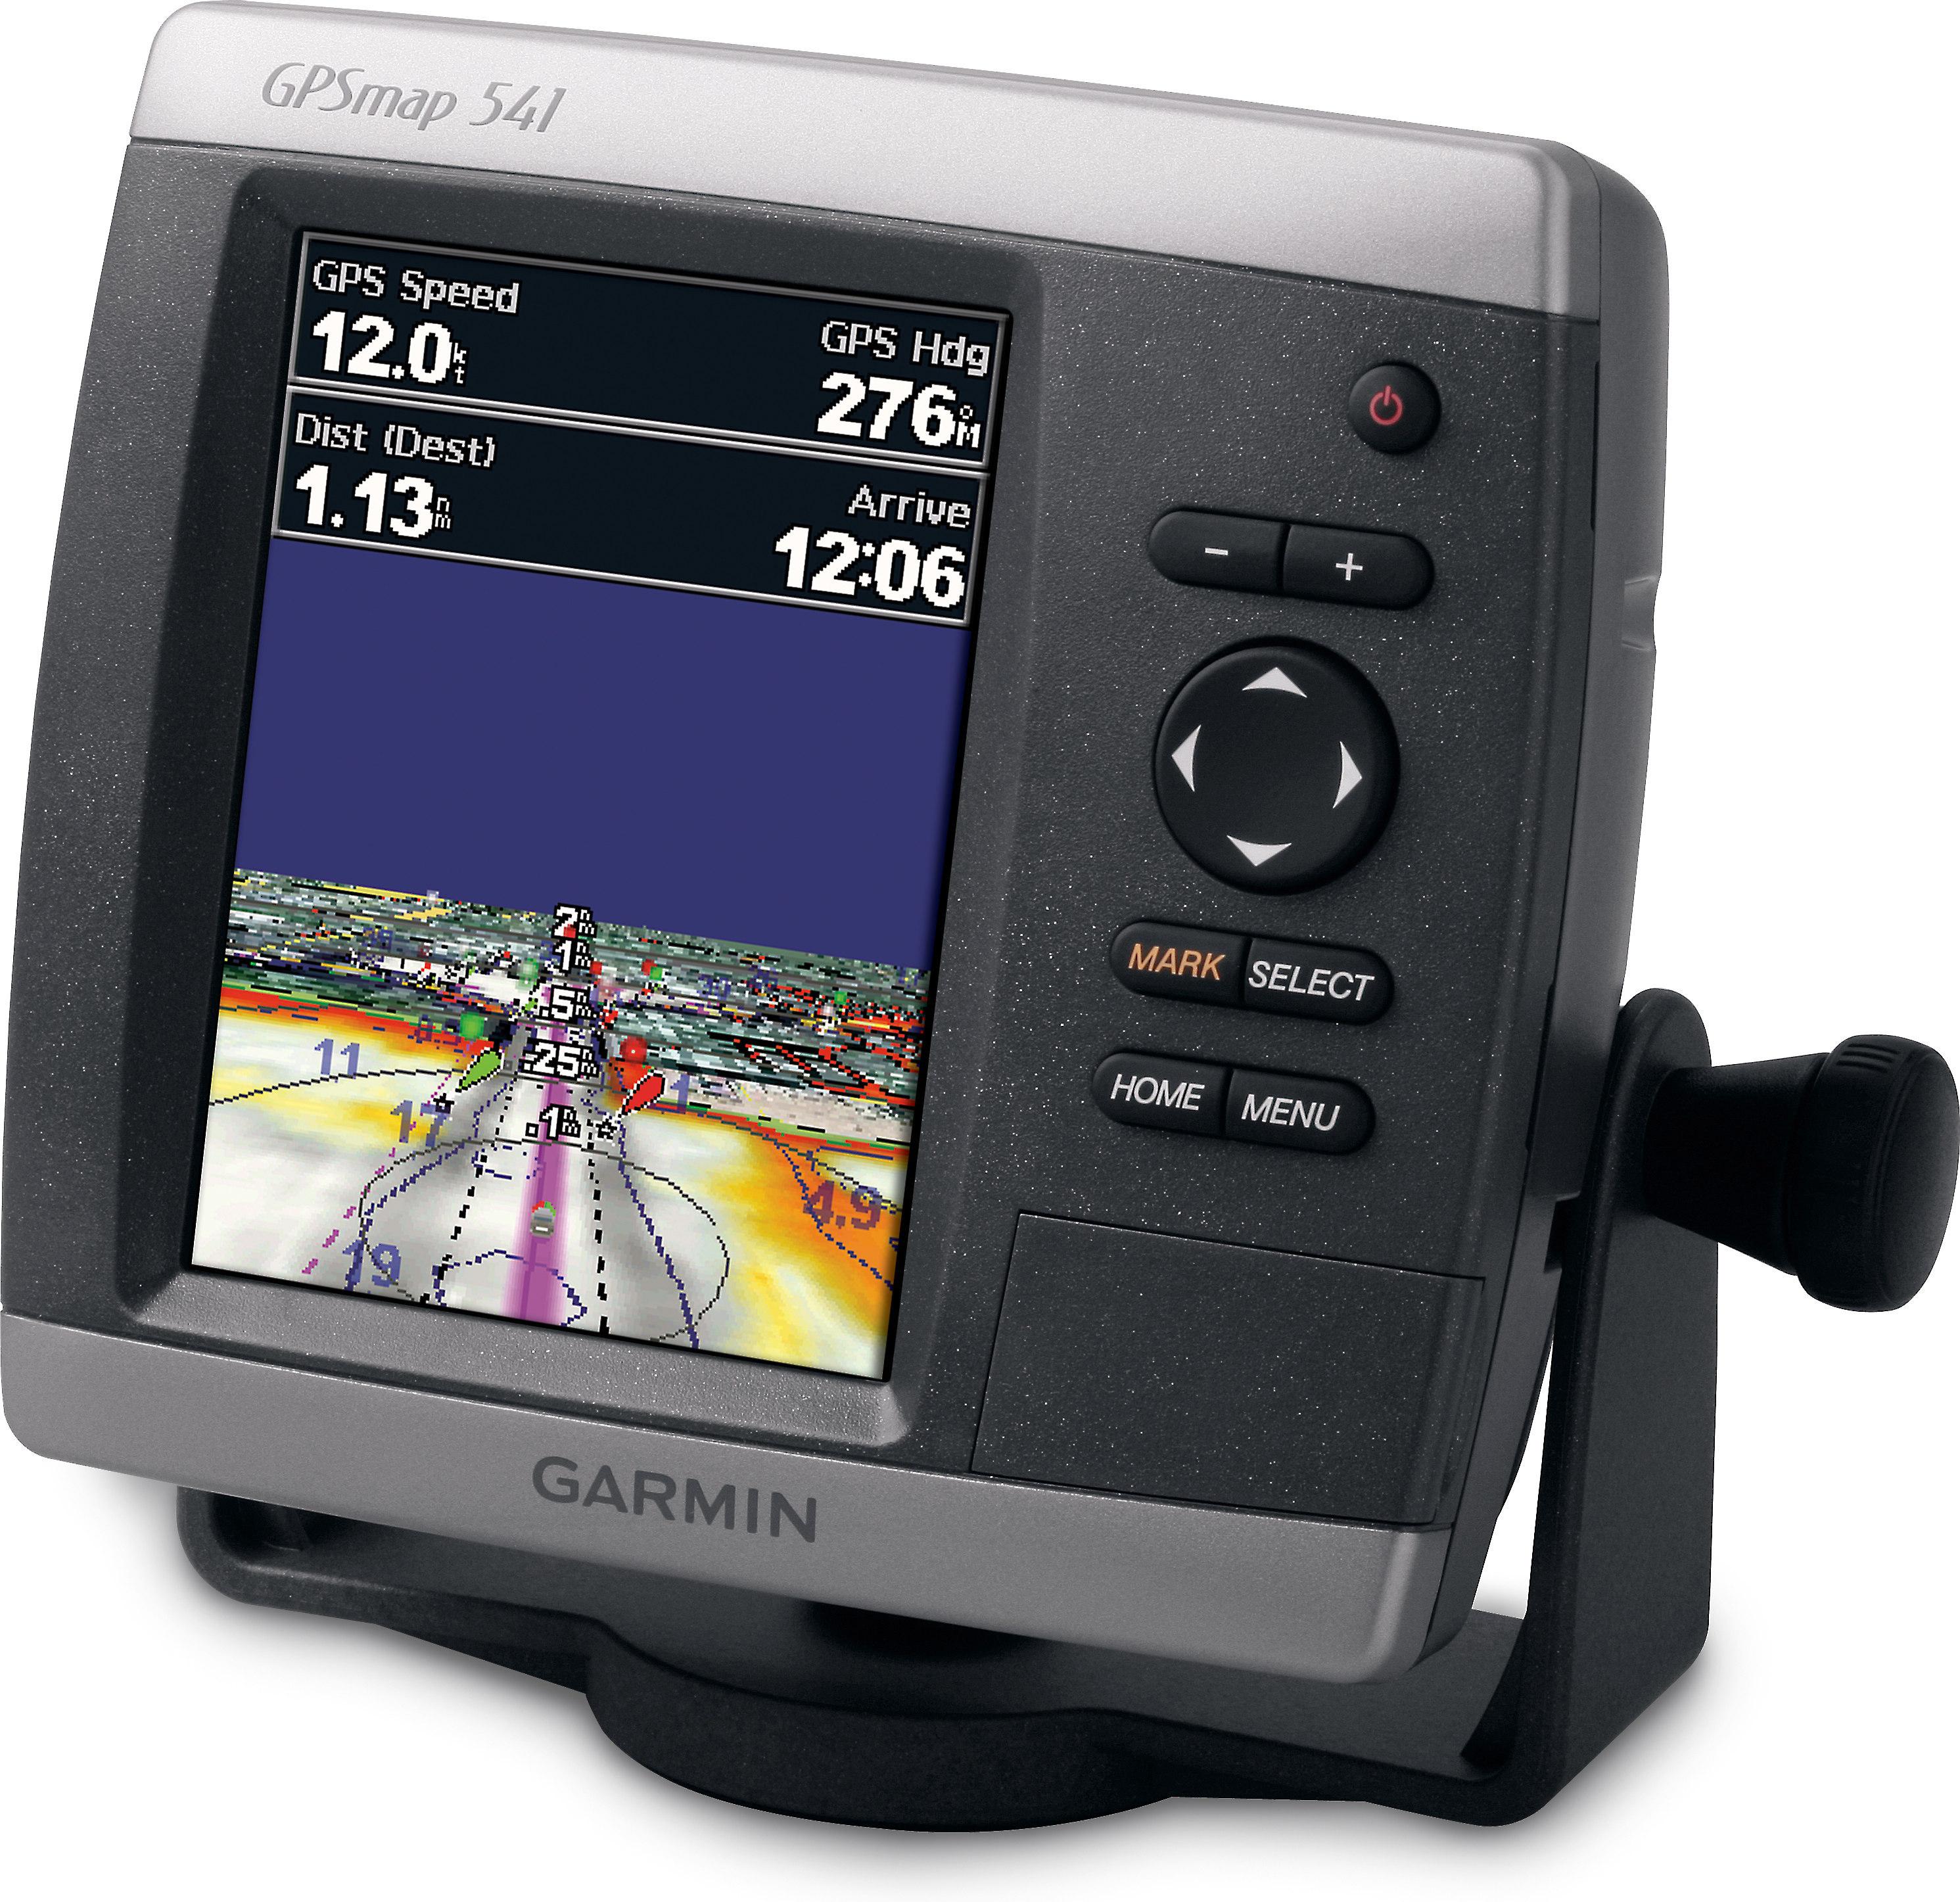 Garmin GPSMAP 541 Chartplotter with 5